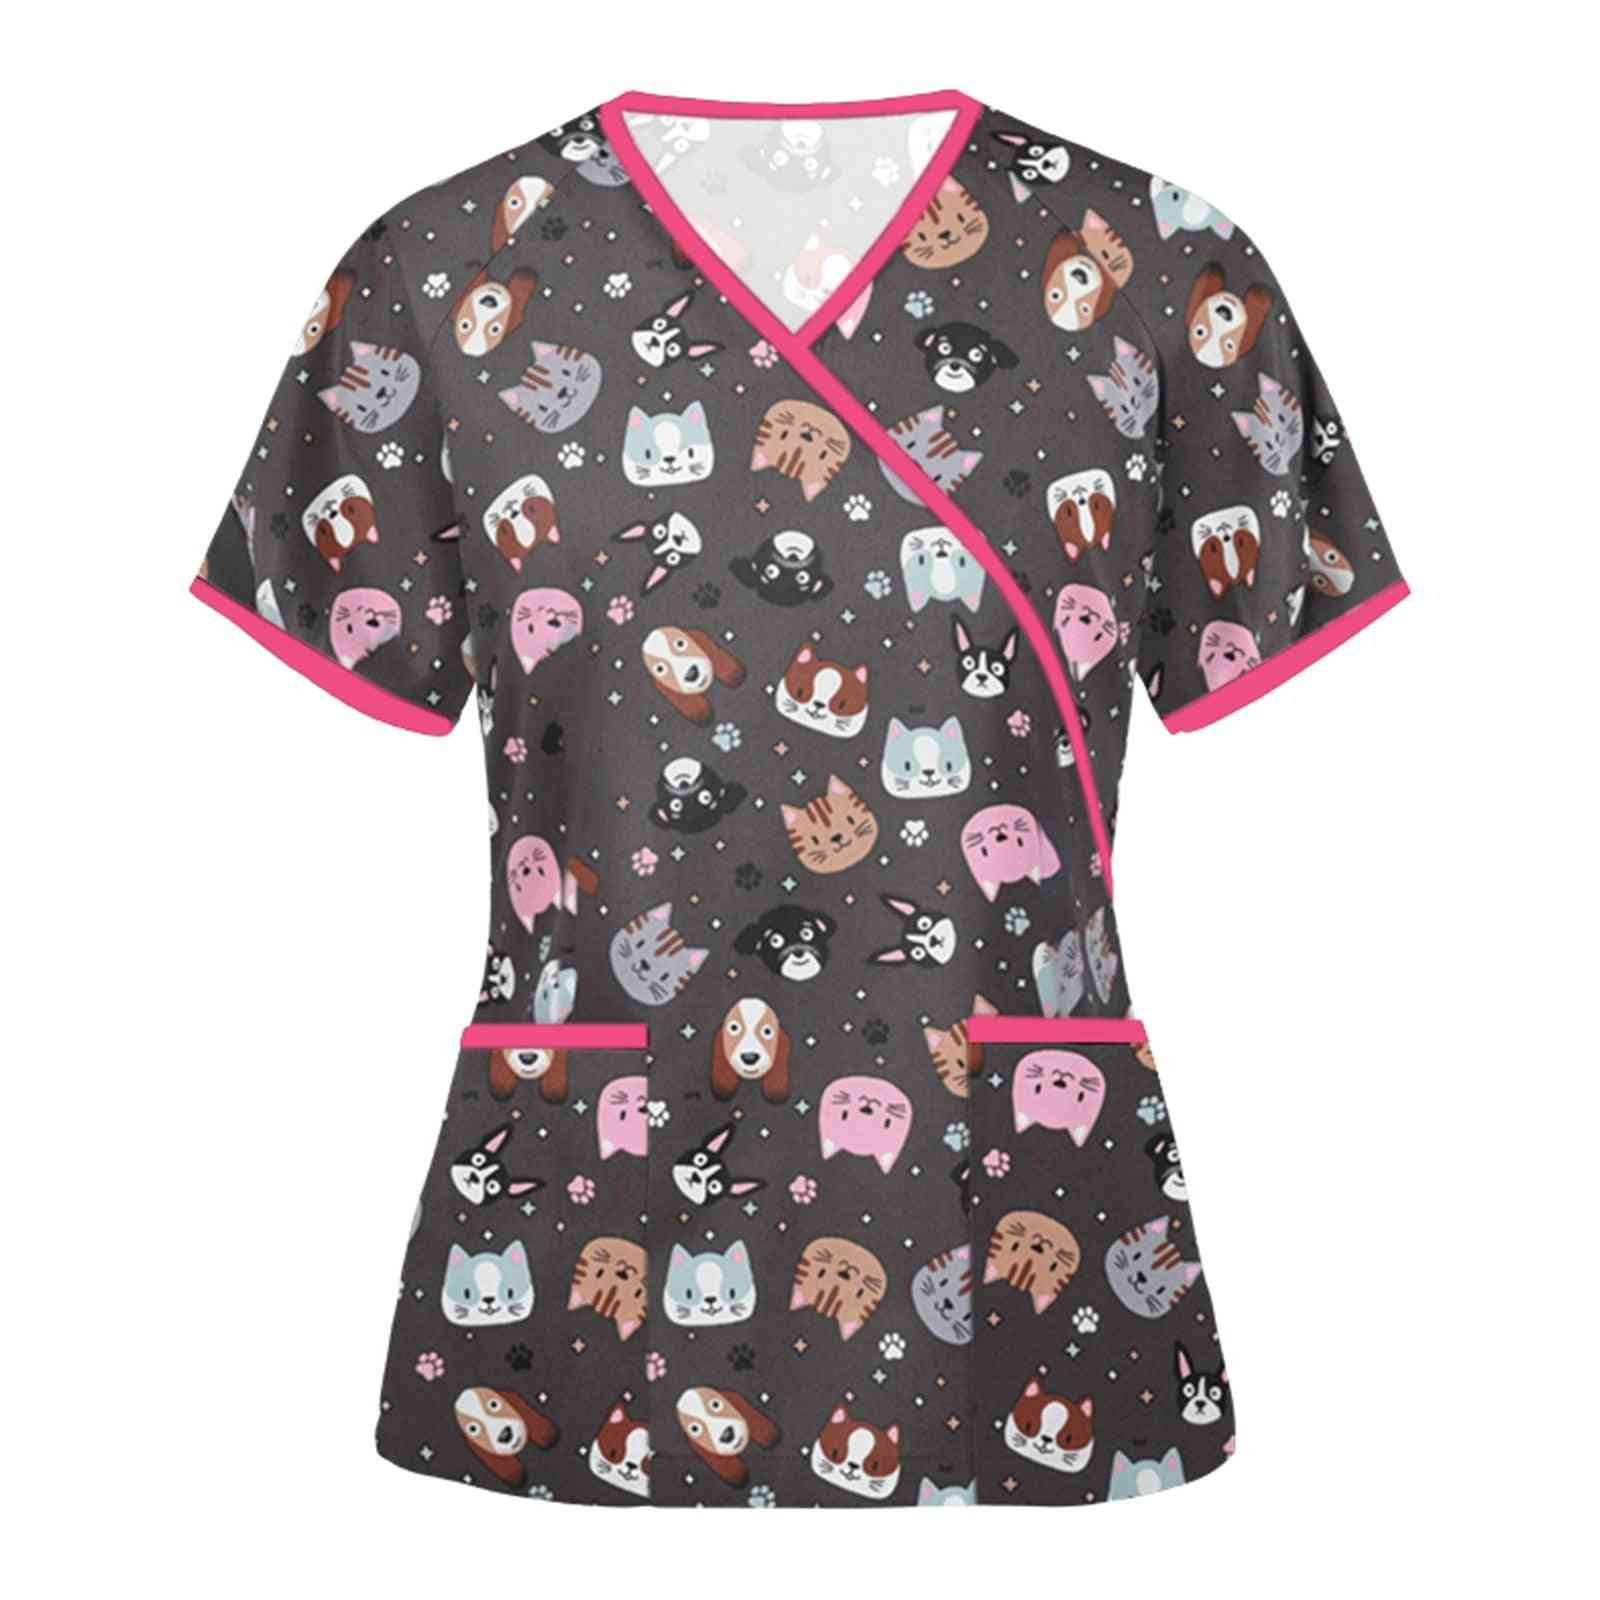 Women Blouse Fashion Short Sleeve Scrubs Tops Neck Pet Tops Working Uniform